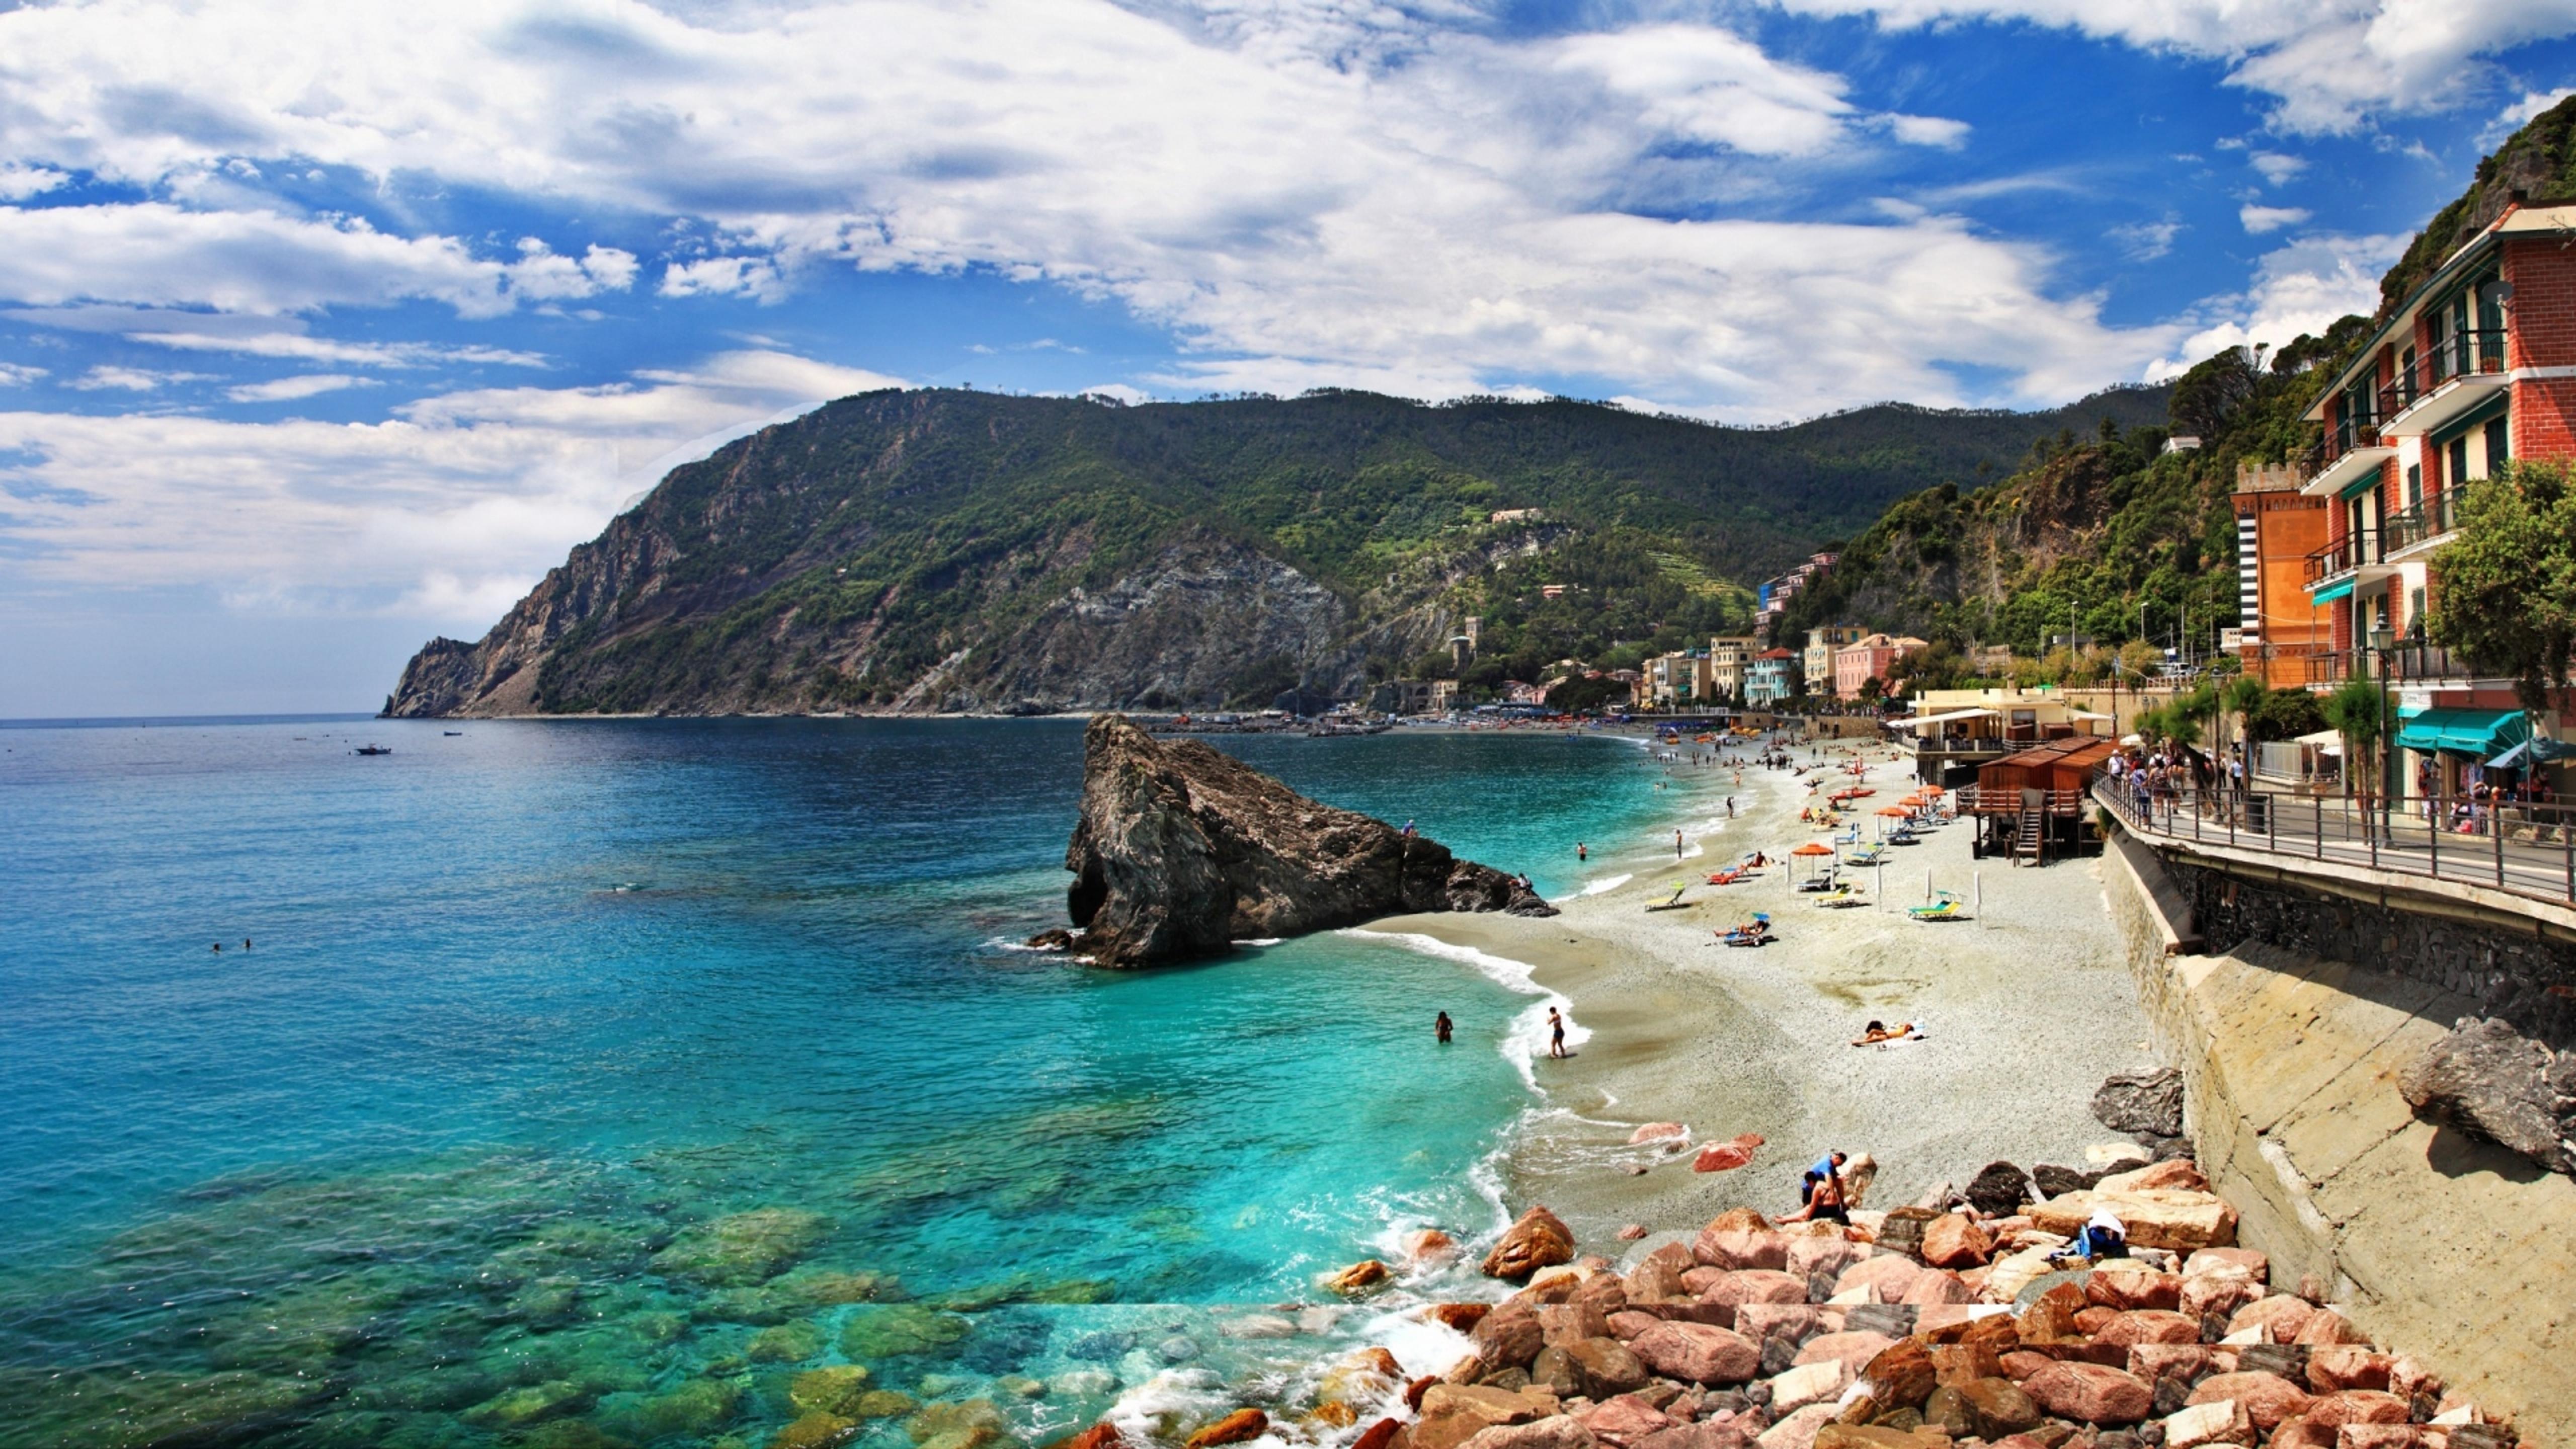 sea monterosso italy - photo #2